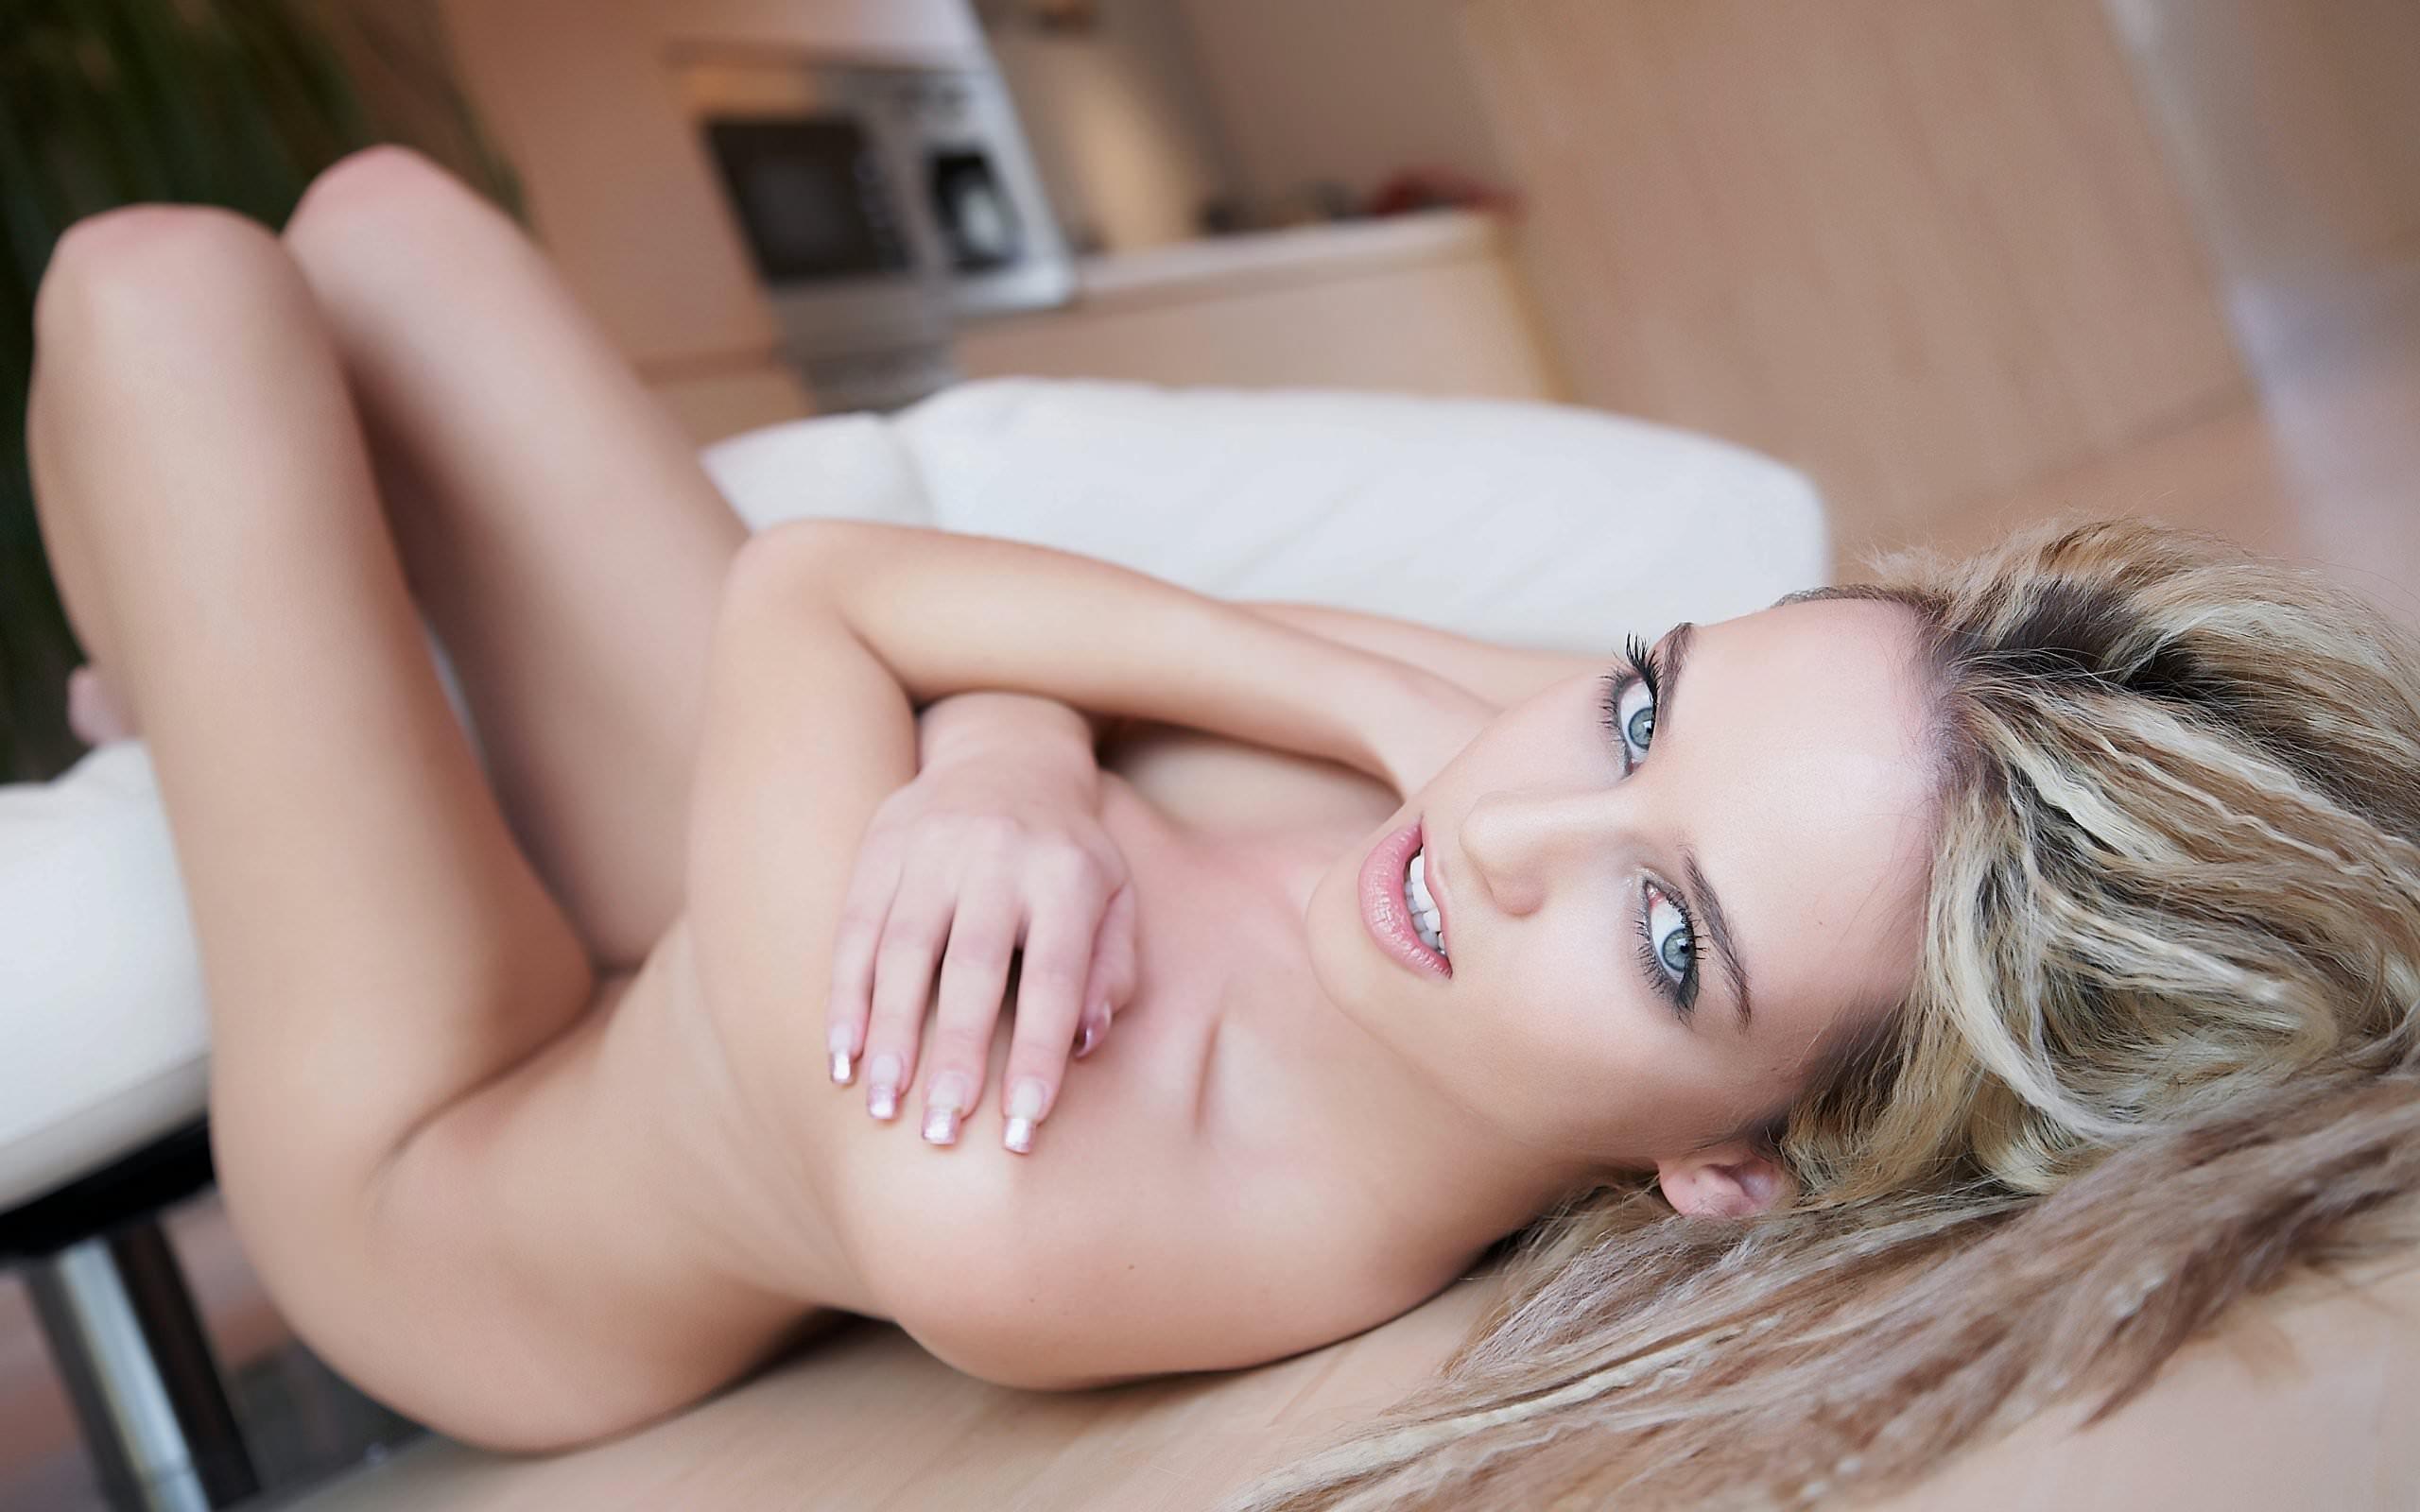 Blonde erotic stories